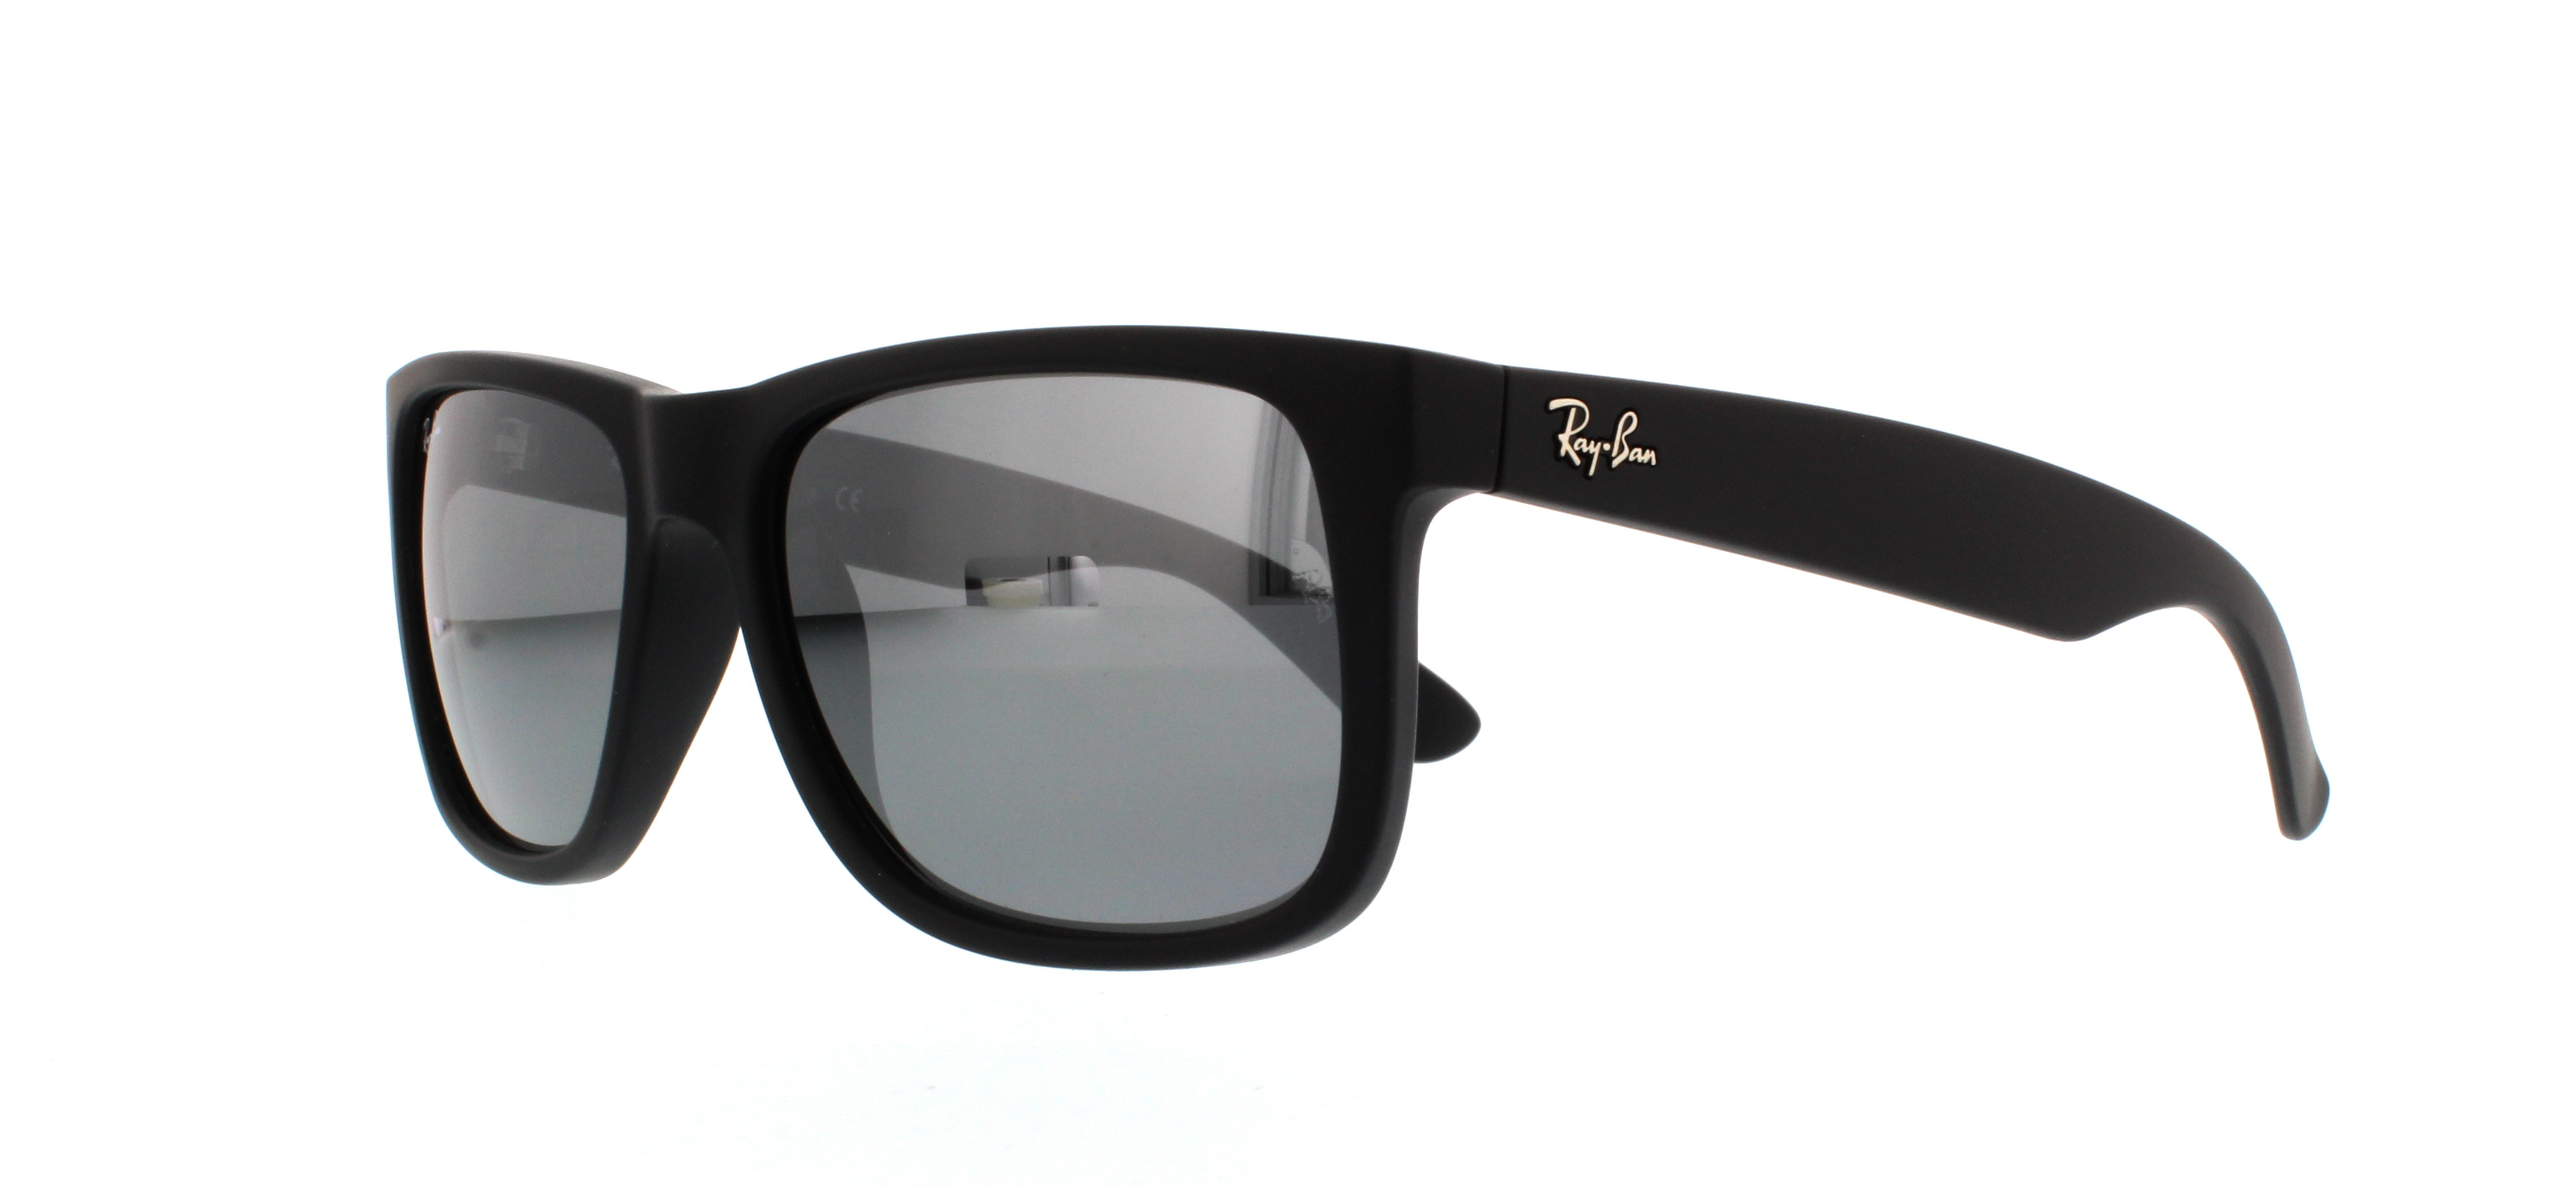 622/6G Rubber Black